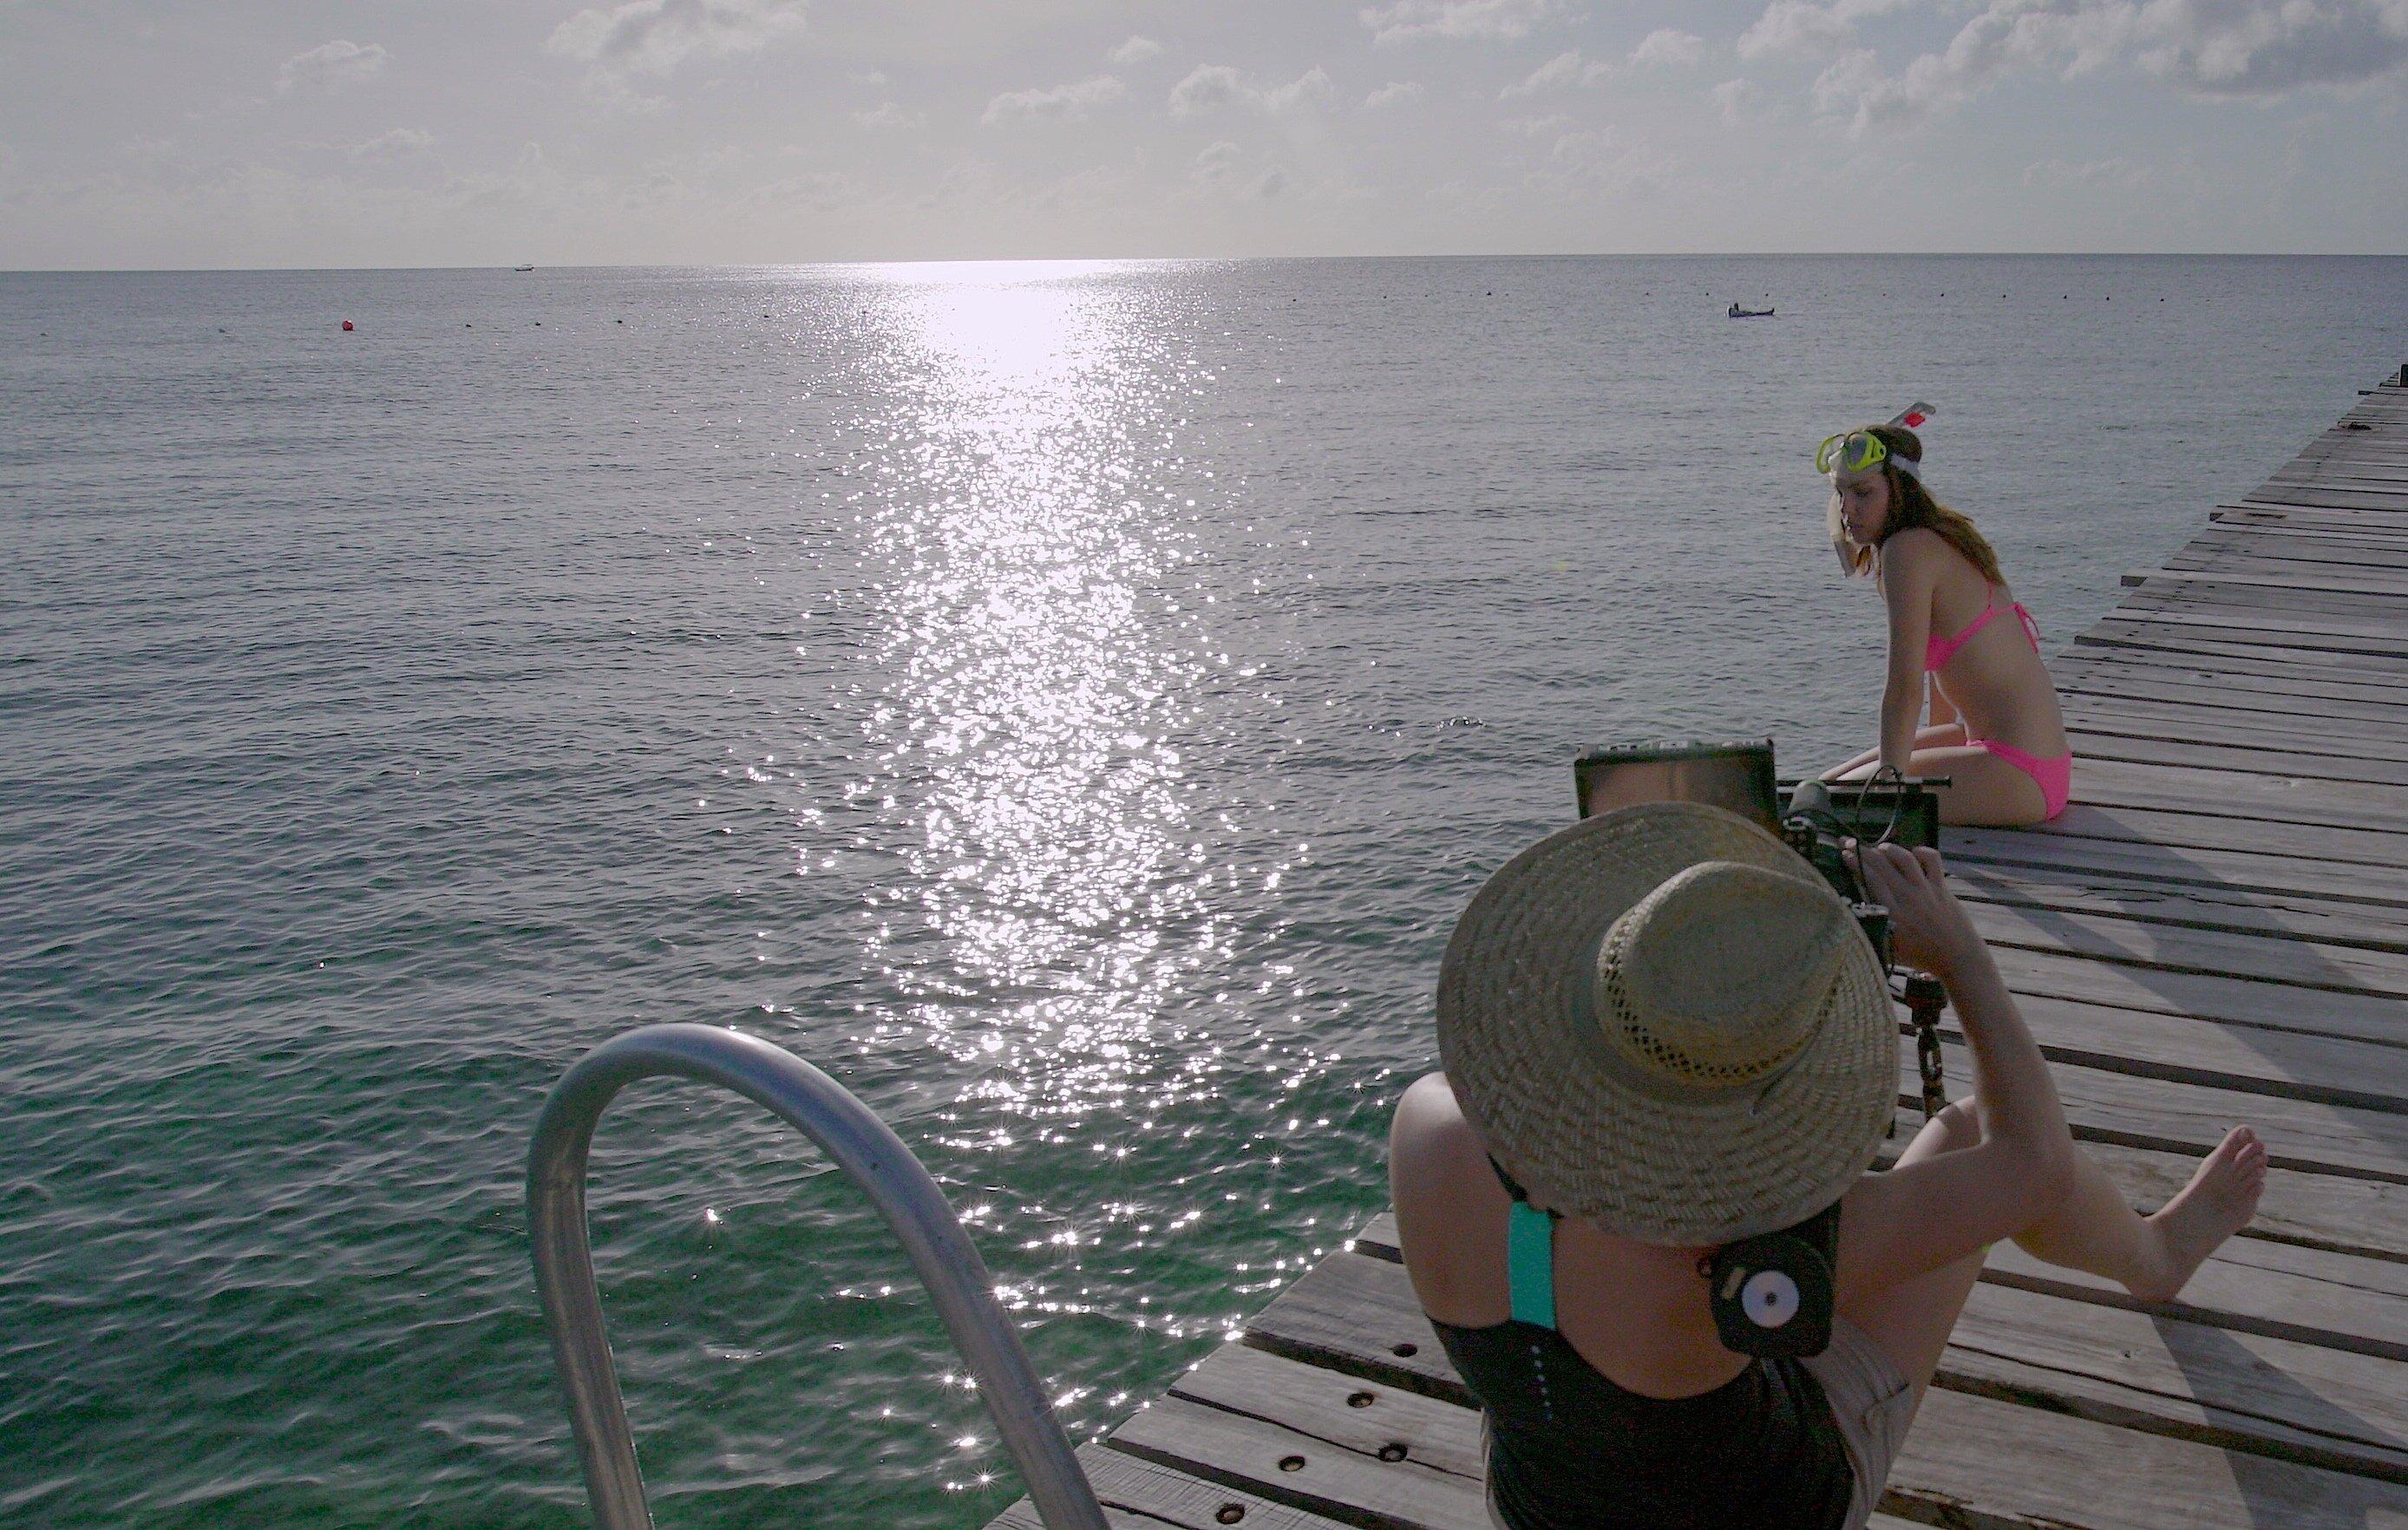 Kimberly Leemans and Fiorella Occhipinti in The Big Swim (2016)